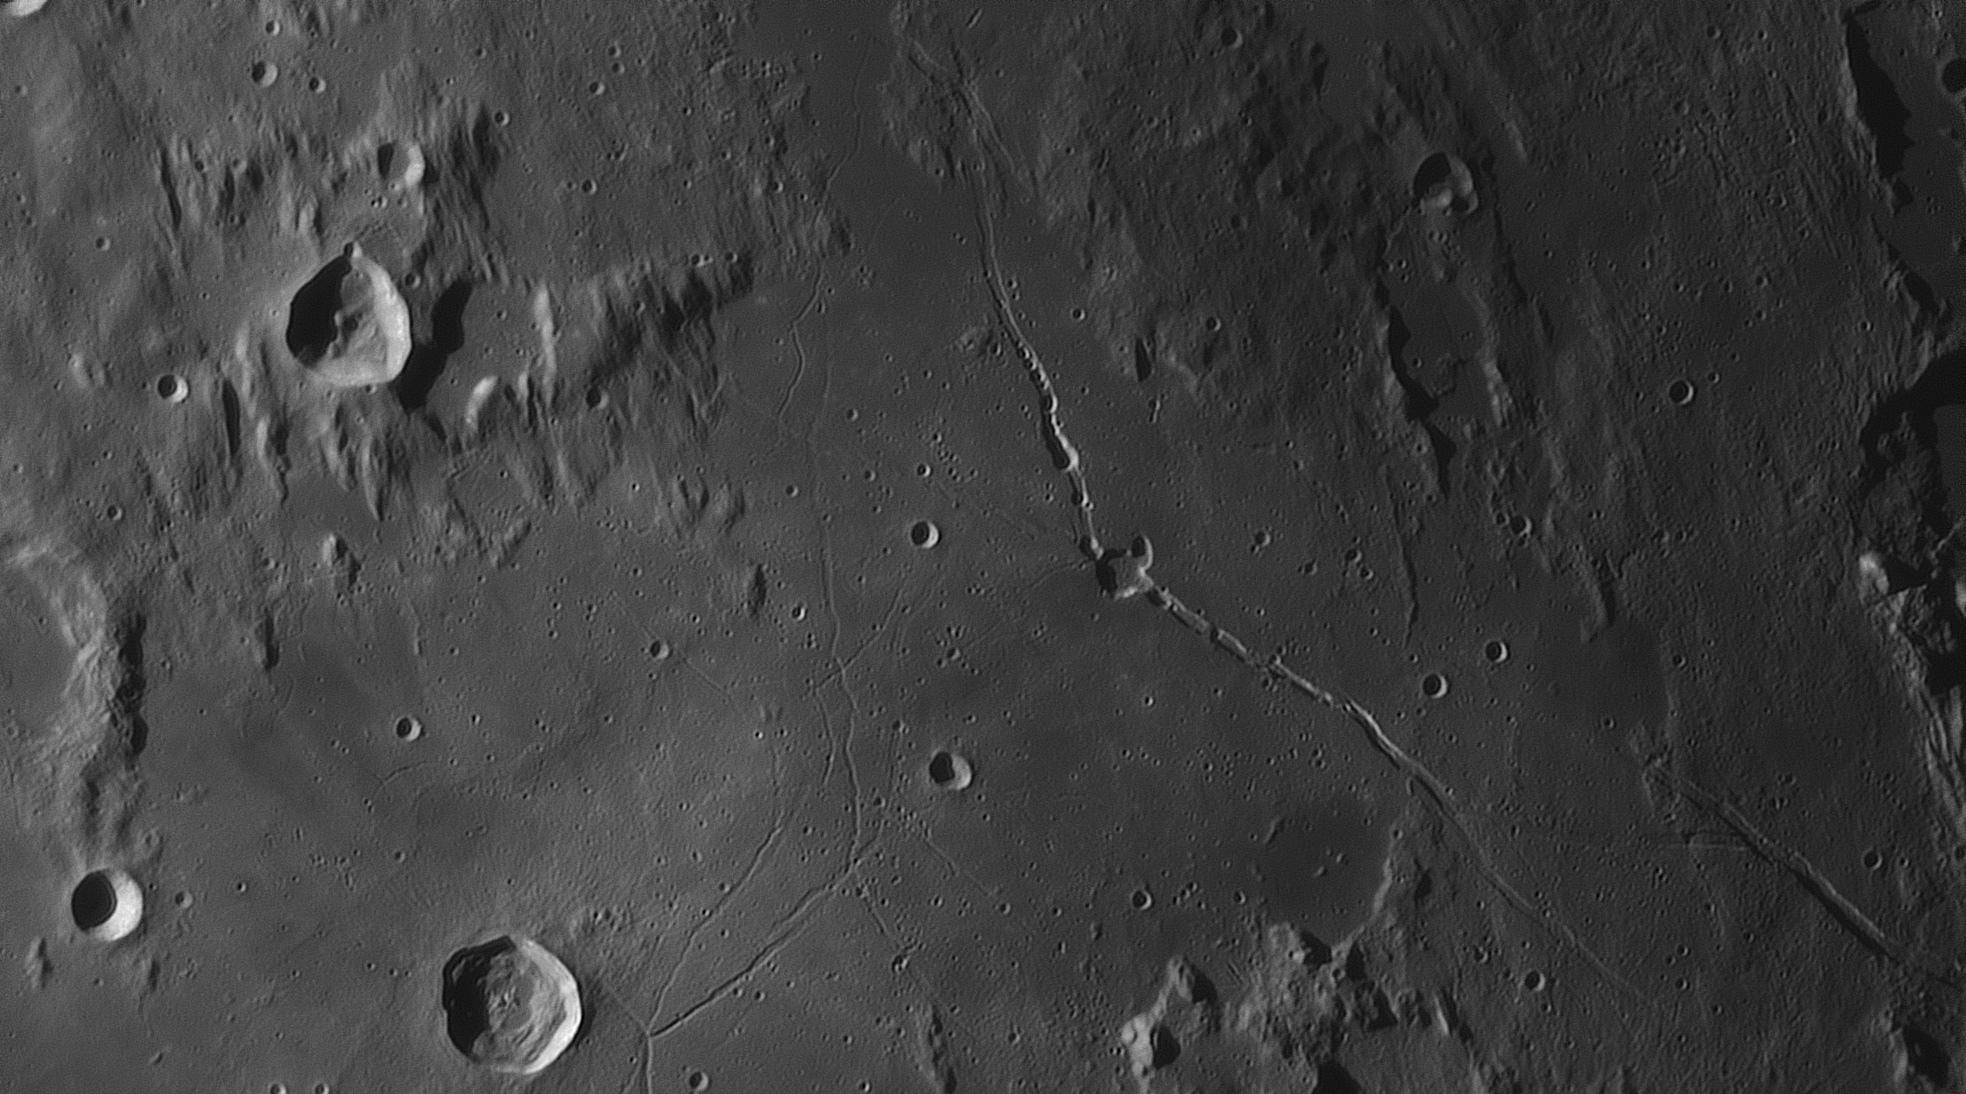 large.moon_23_07_2019_04_05_59_HYGINUS.jpg.f85f06458960cf097d950d0fdaaf4063.jpg